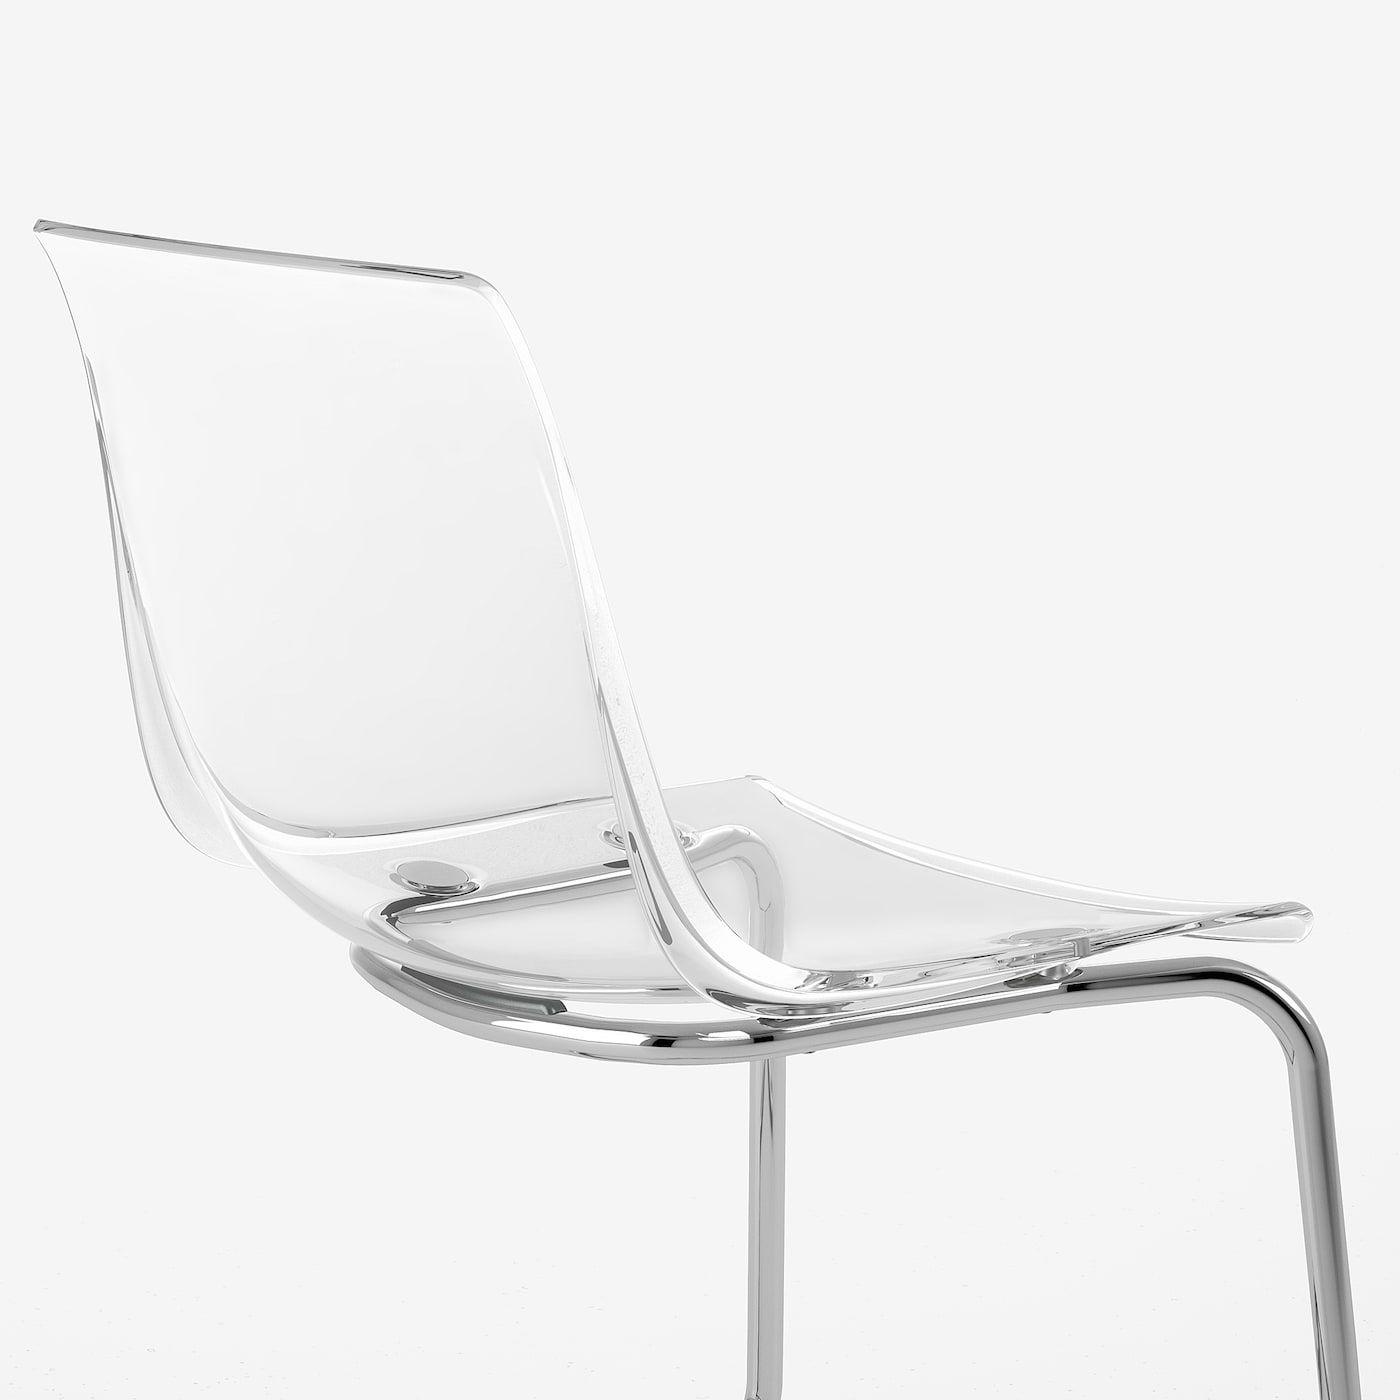 Tobias Stuhl Transparent Verchromt Ikea Osterreich Durchsichtige Stuhle Transparente Stuhle Stuhle